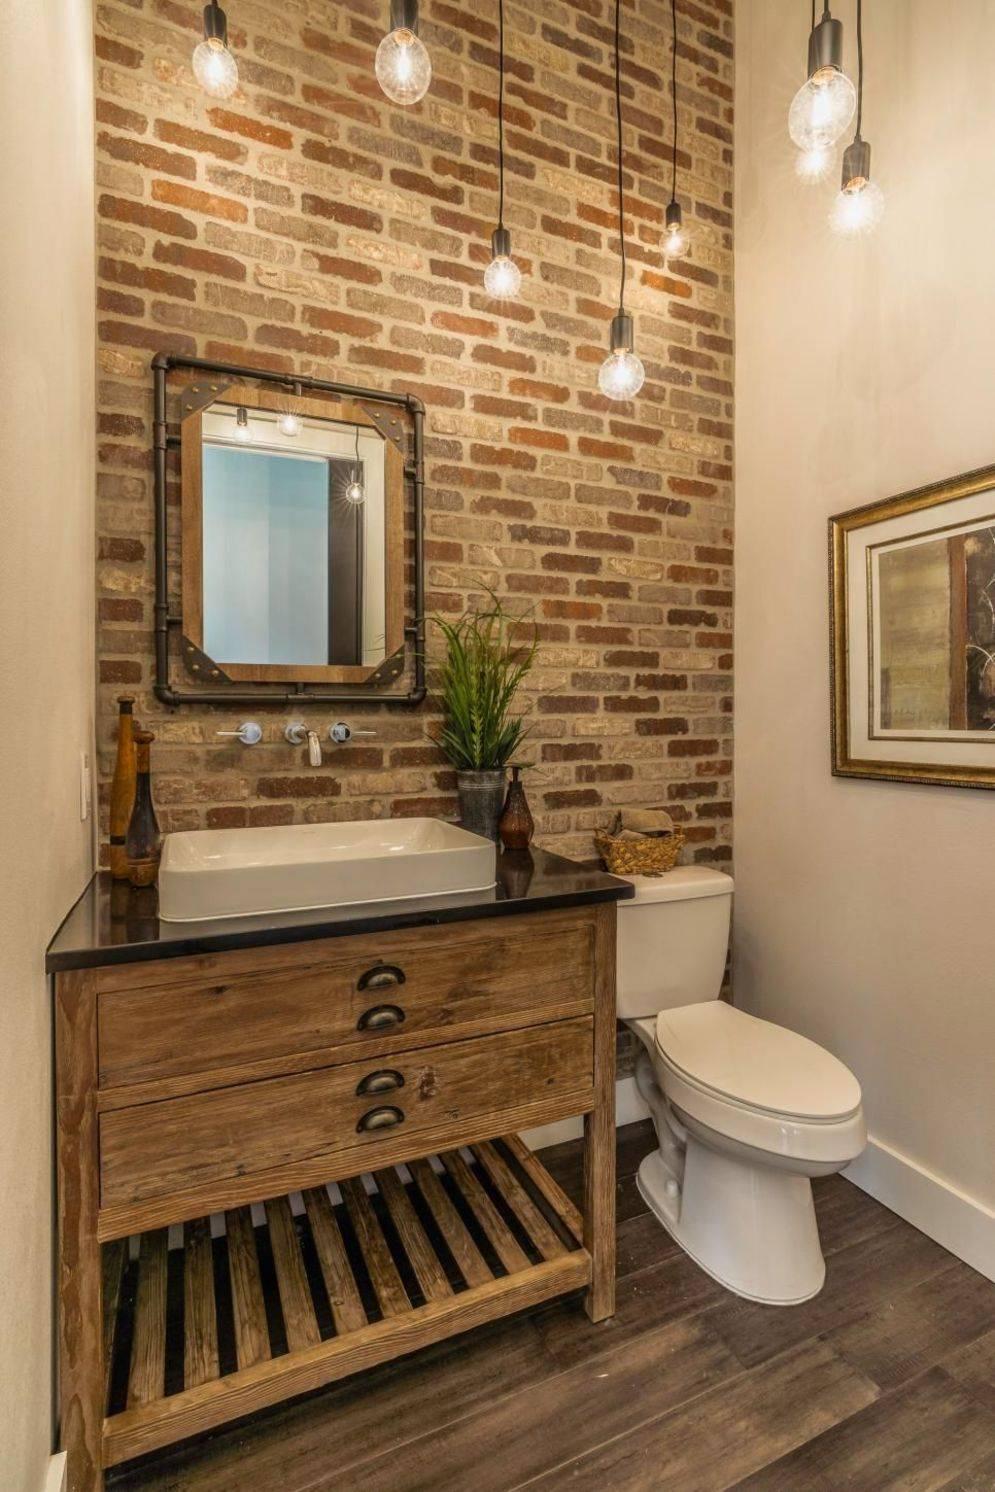 Bathroom Vanity on Brick Accent Wall